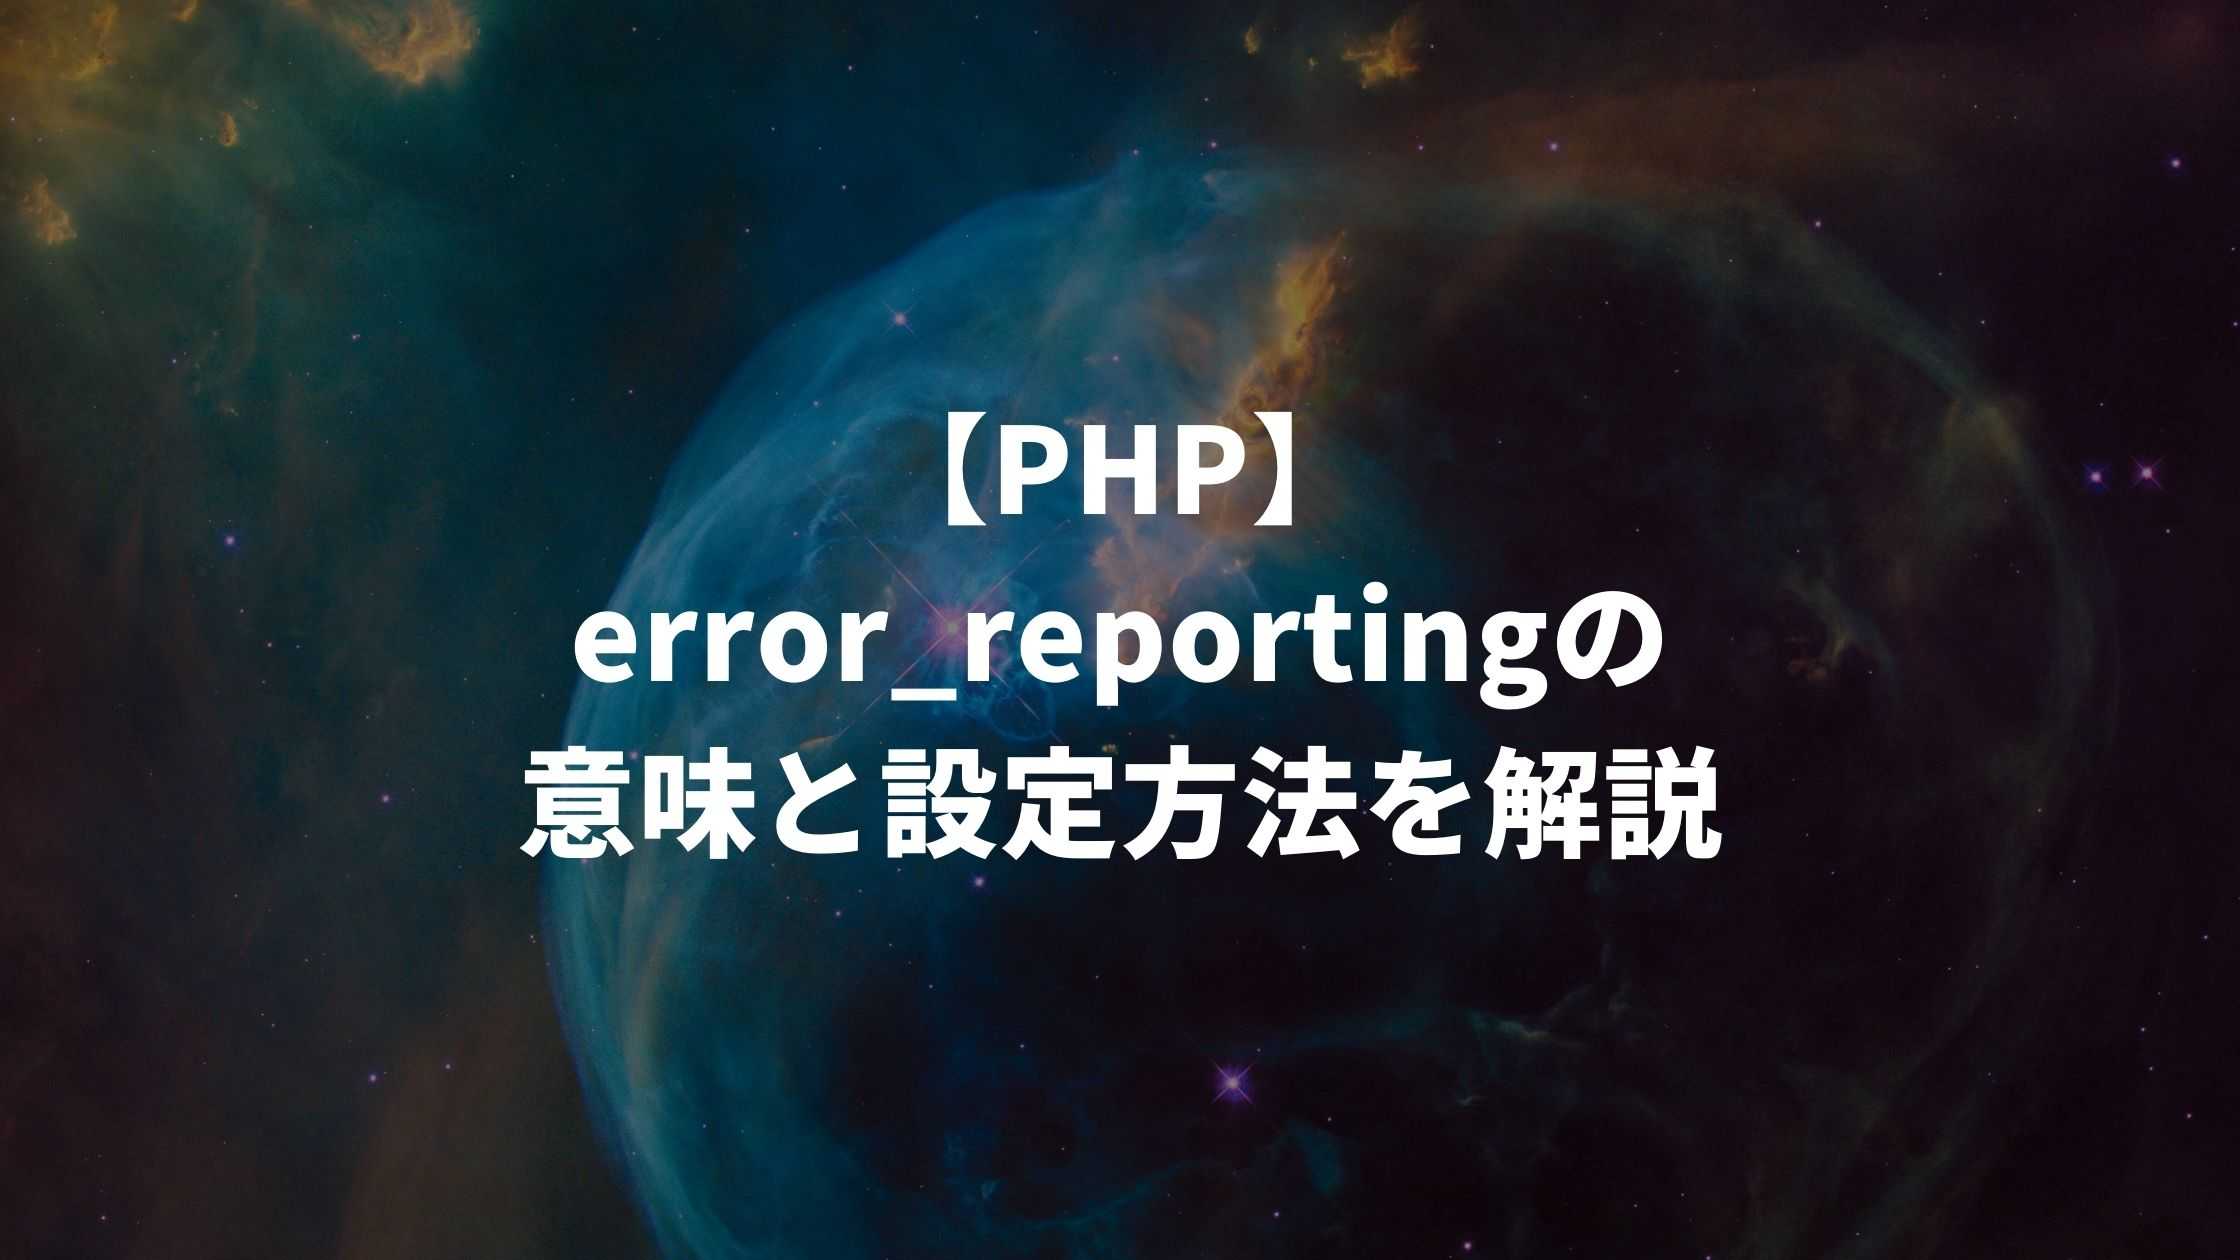 【PHP】error_reportingを利用したエラー出力の設定方法を徹底解説